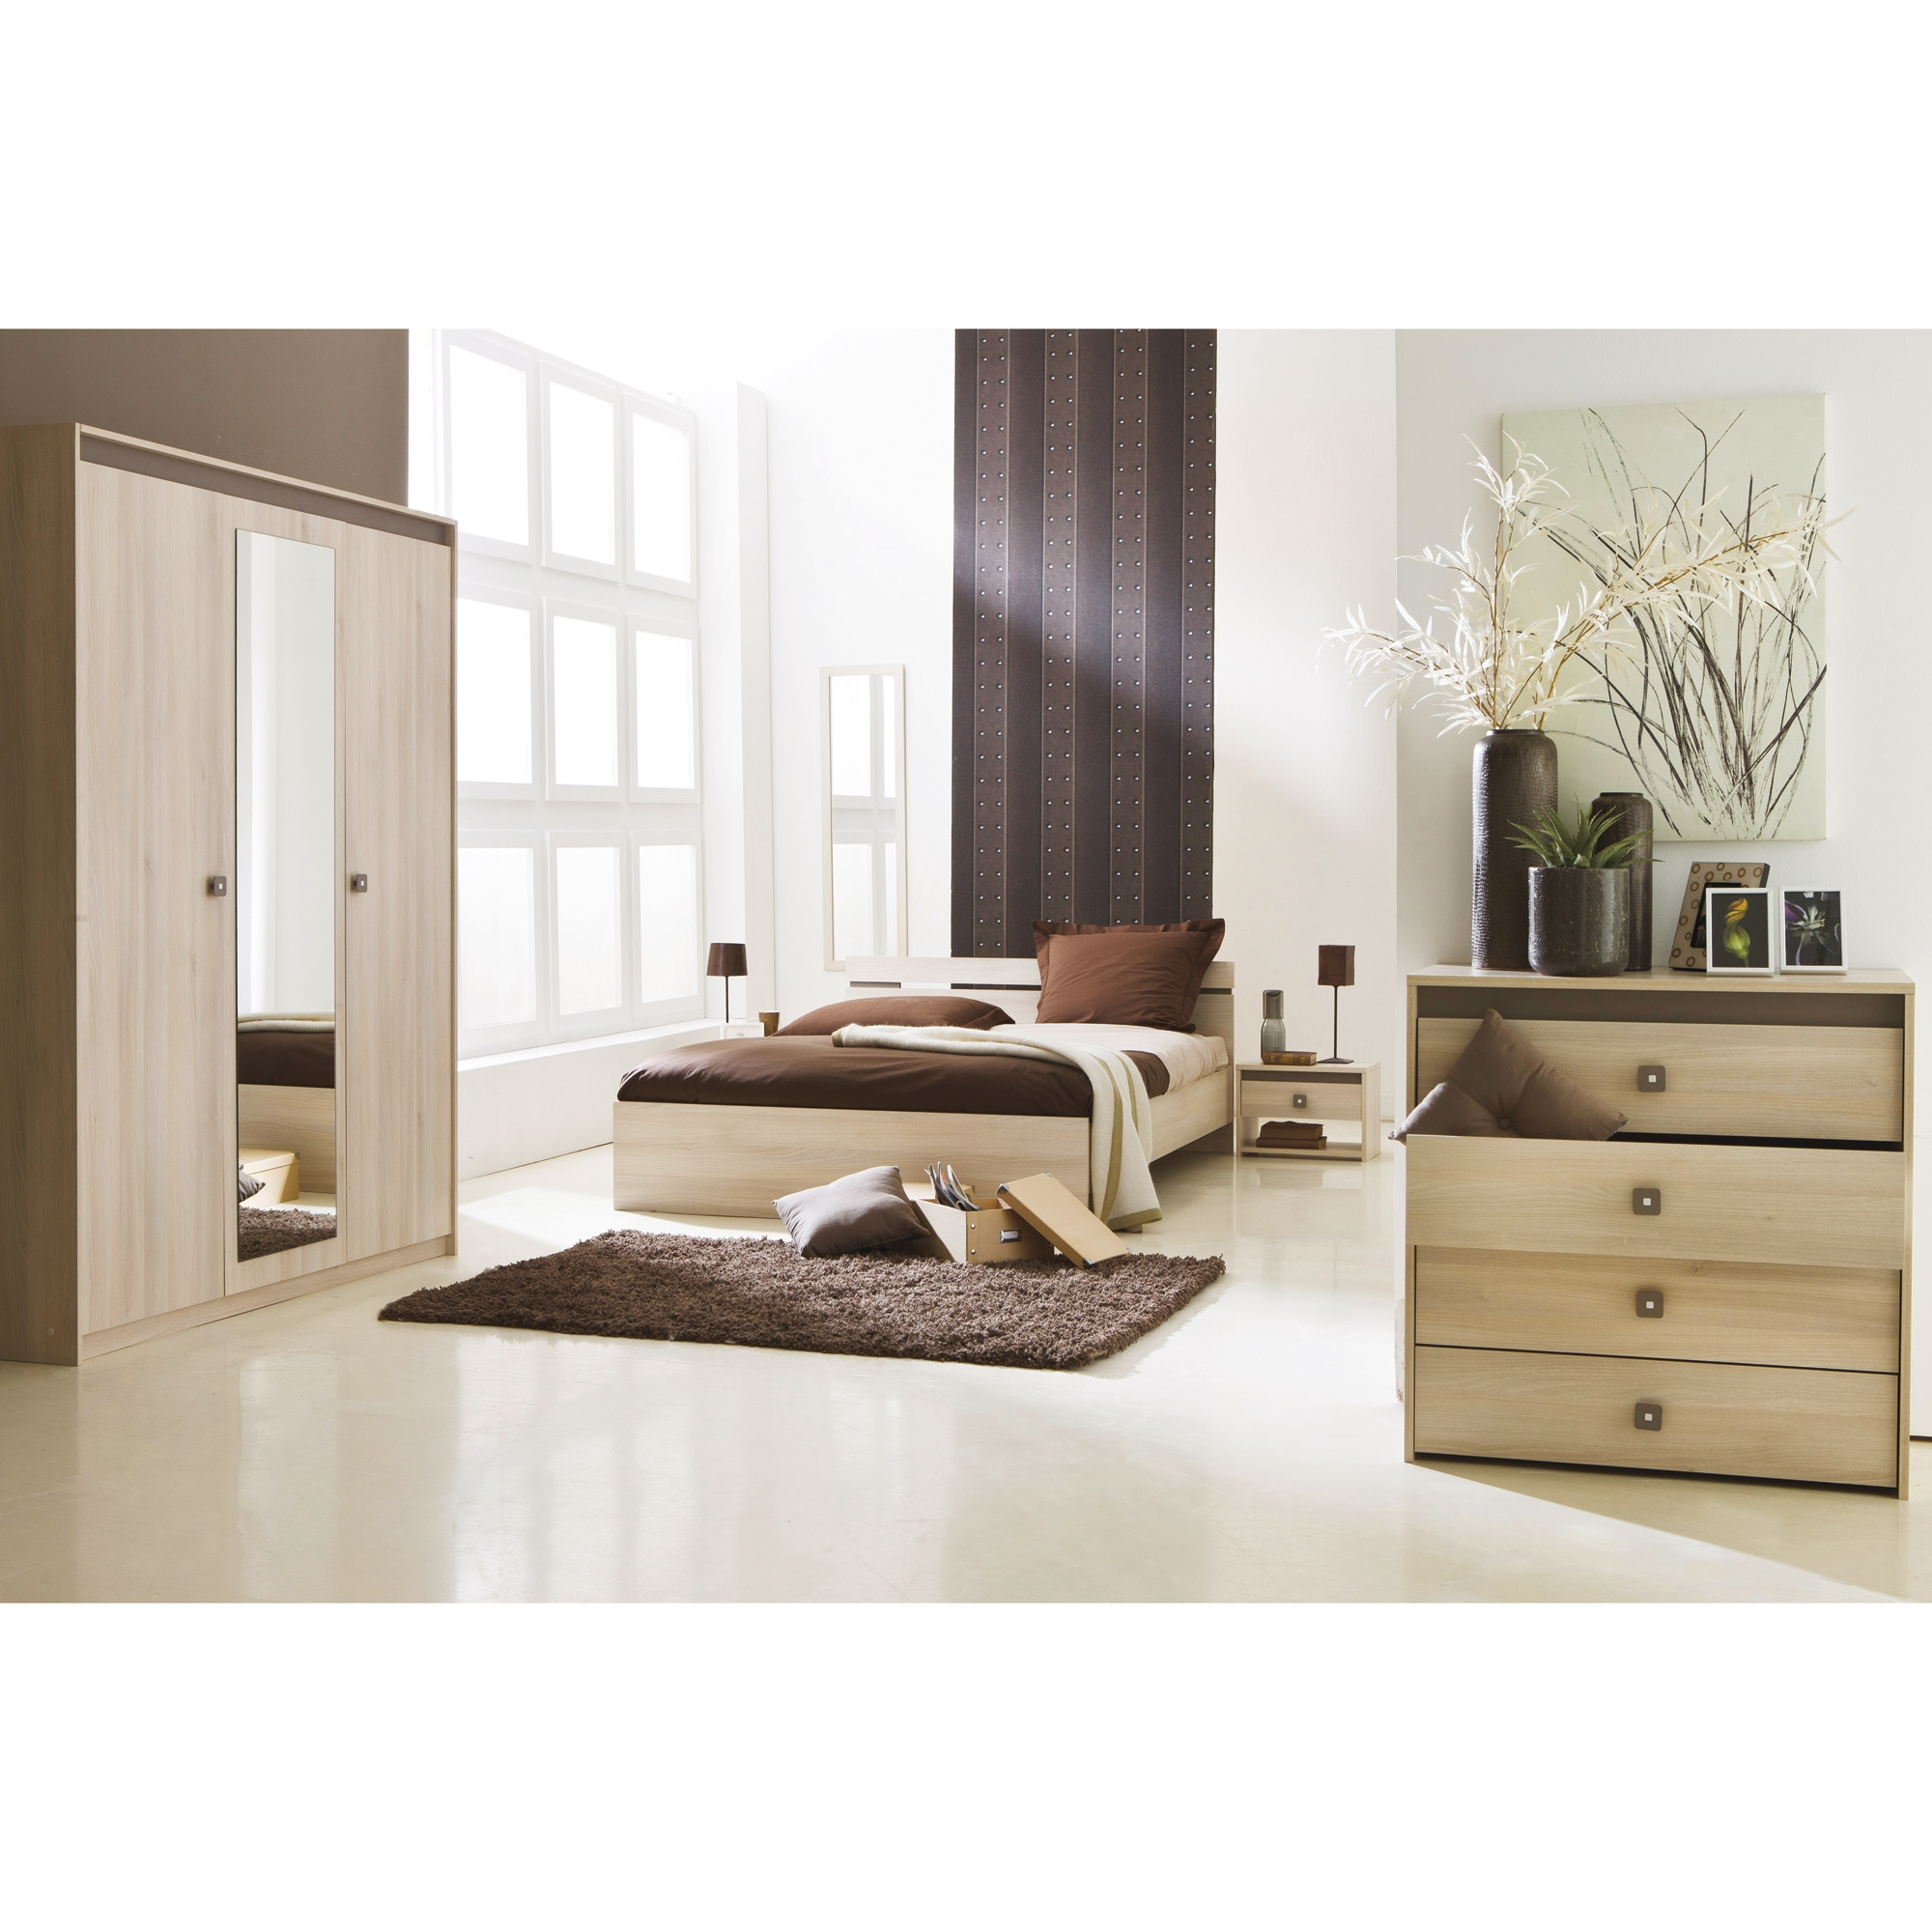 Chambre coucher francesca for Commande chambre a coucher